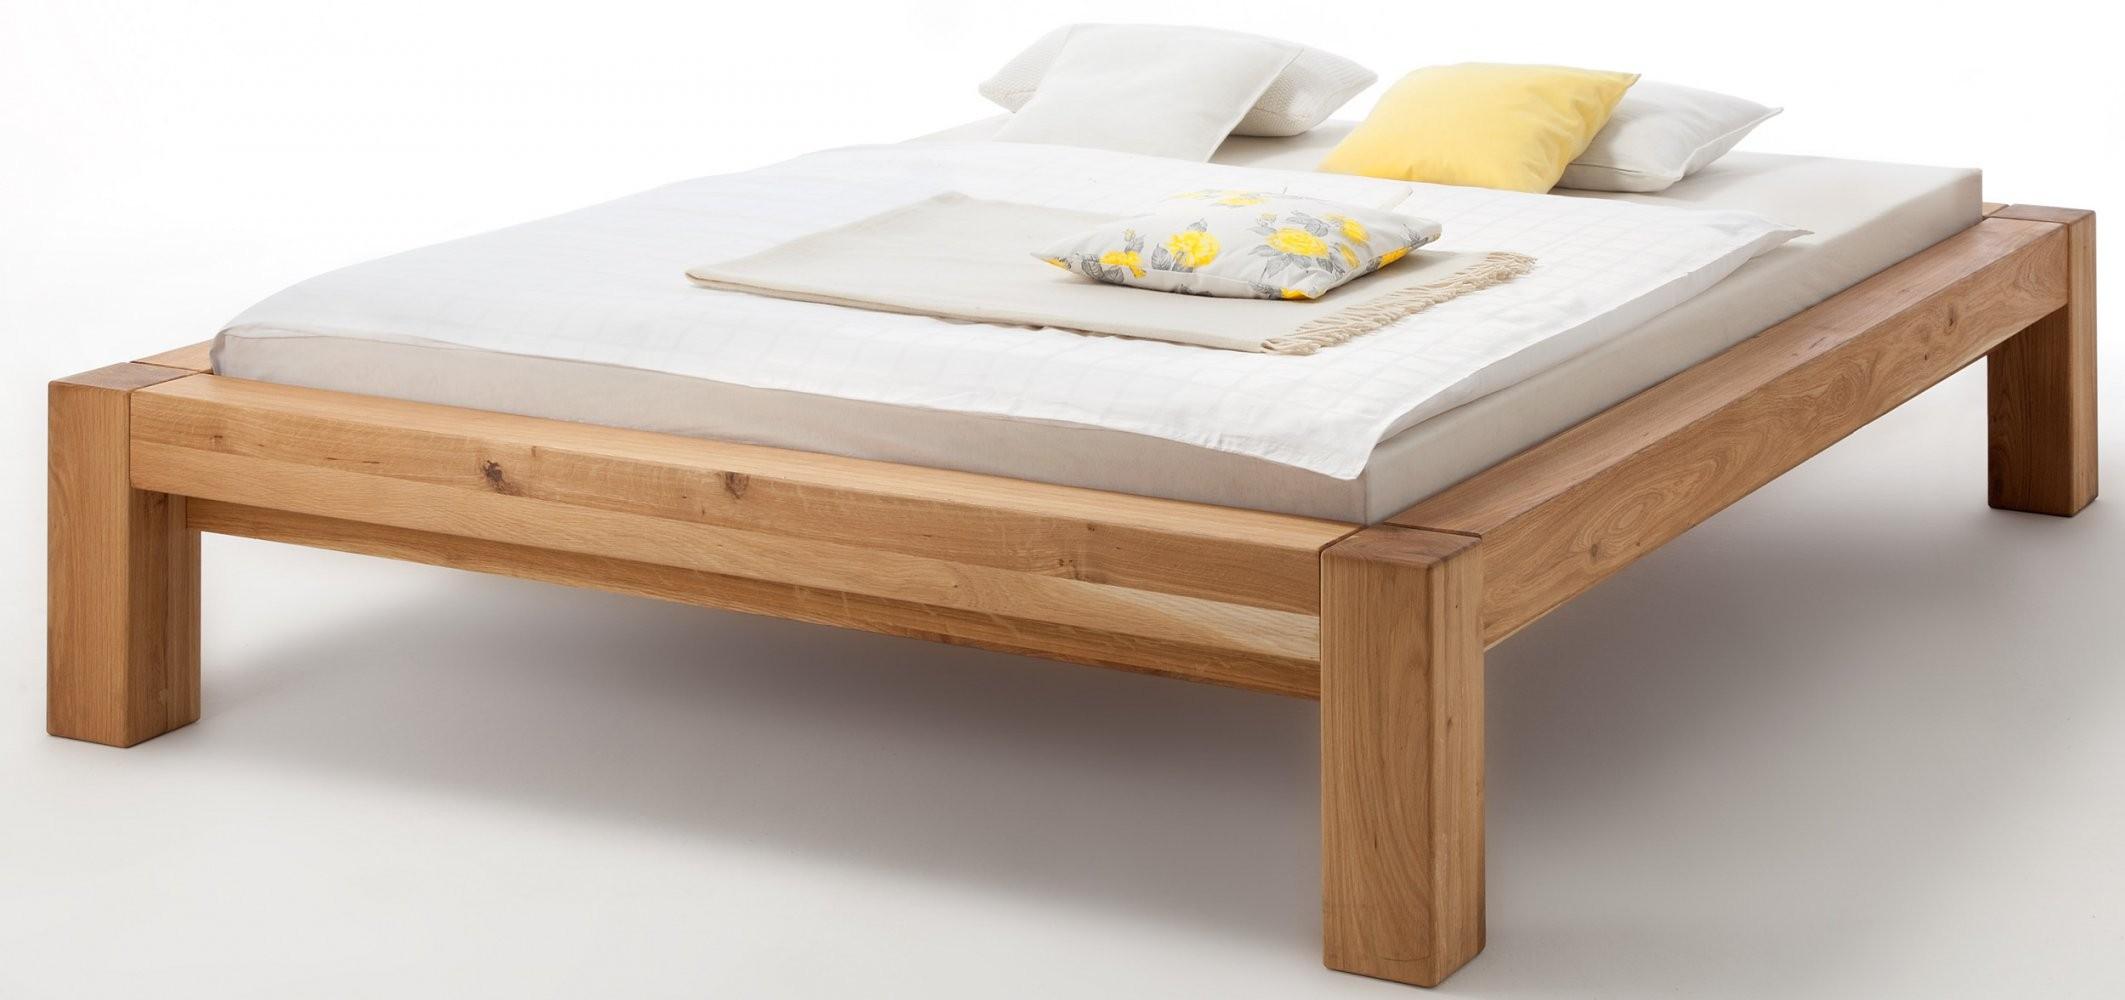 Bettgestell 140X200 Holz Beste Bett Massiv Massivholzbett Buche von Bettgestell 140X200 Holz Bild